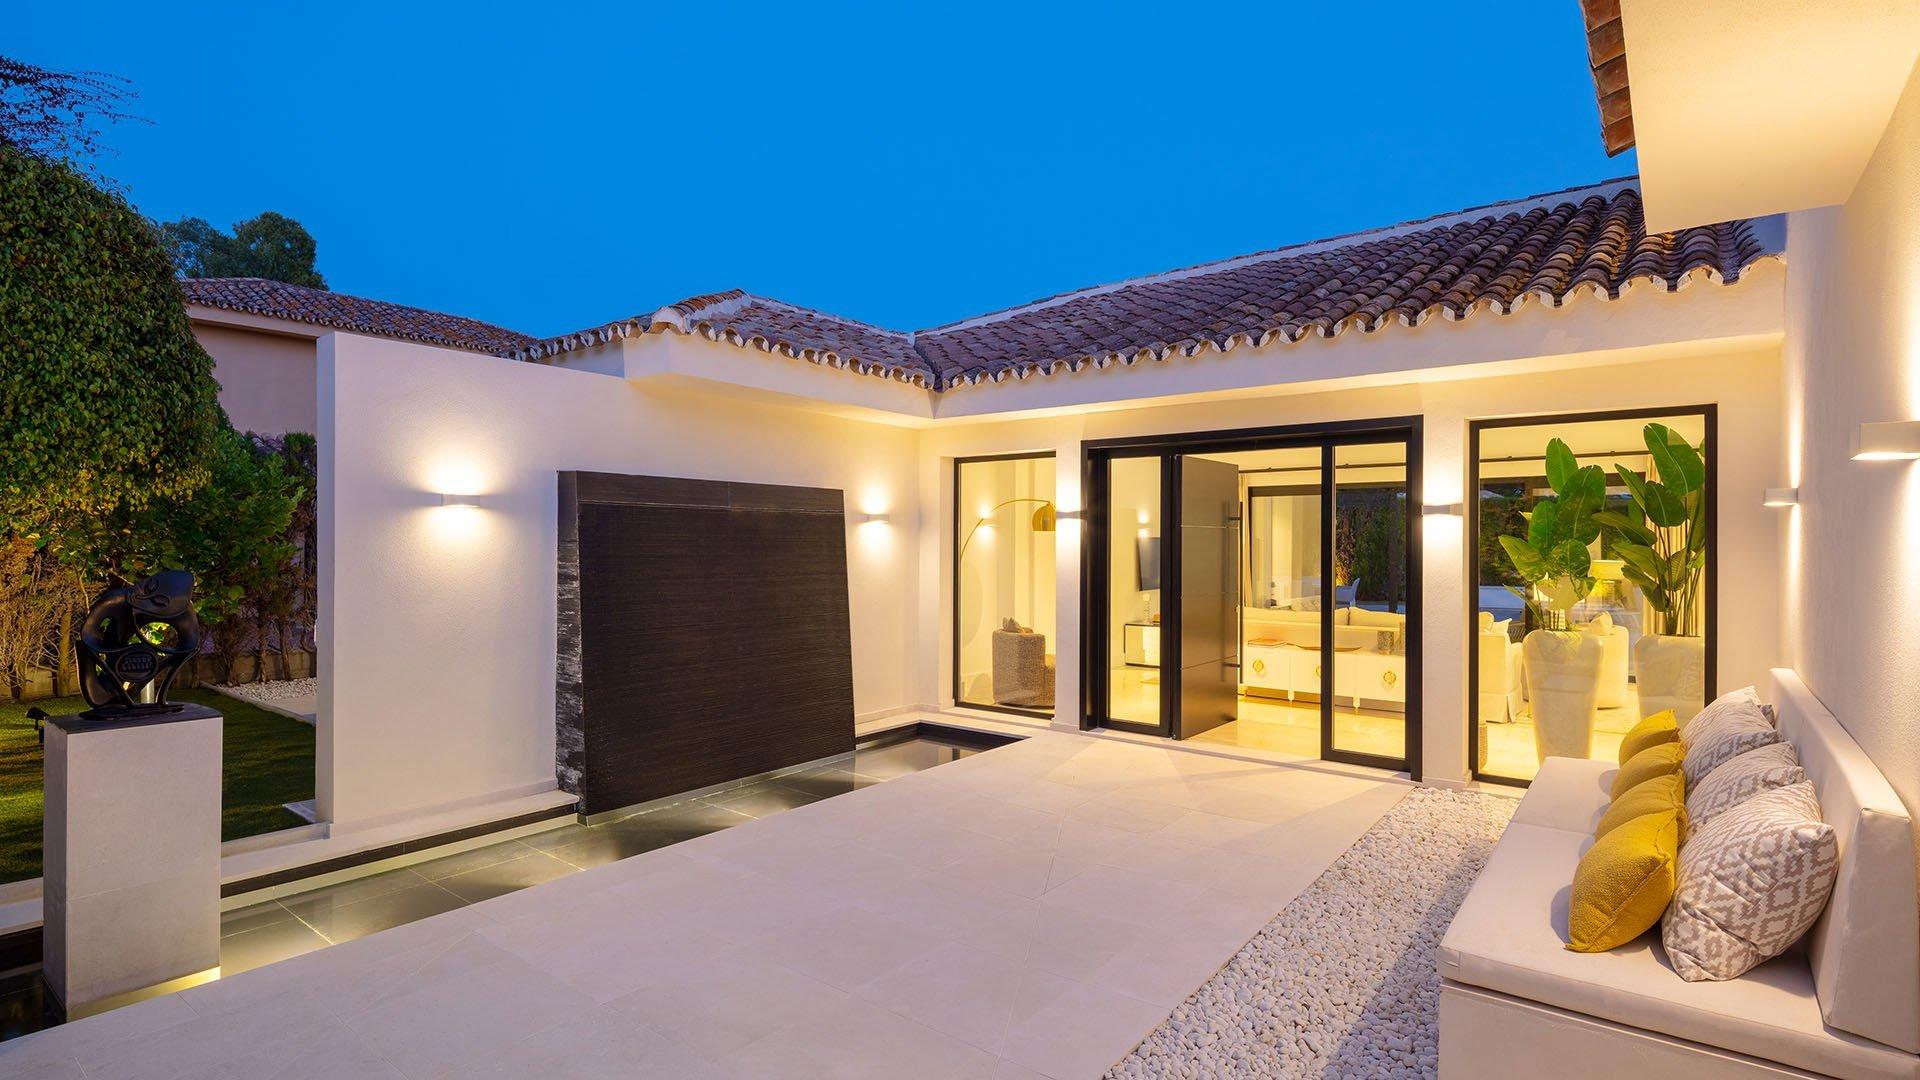 Cortijo Blanco 27: Beautiful villa at walking distance from the beach in Puerto Banús